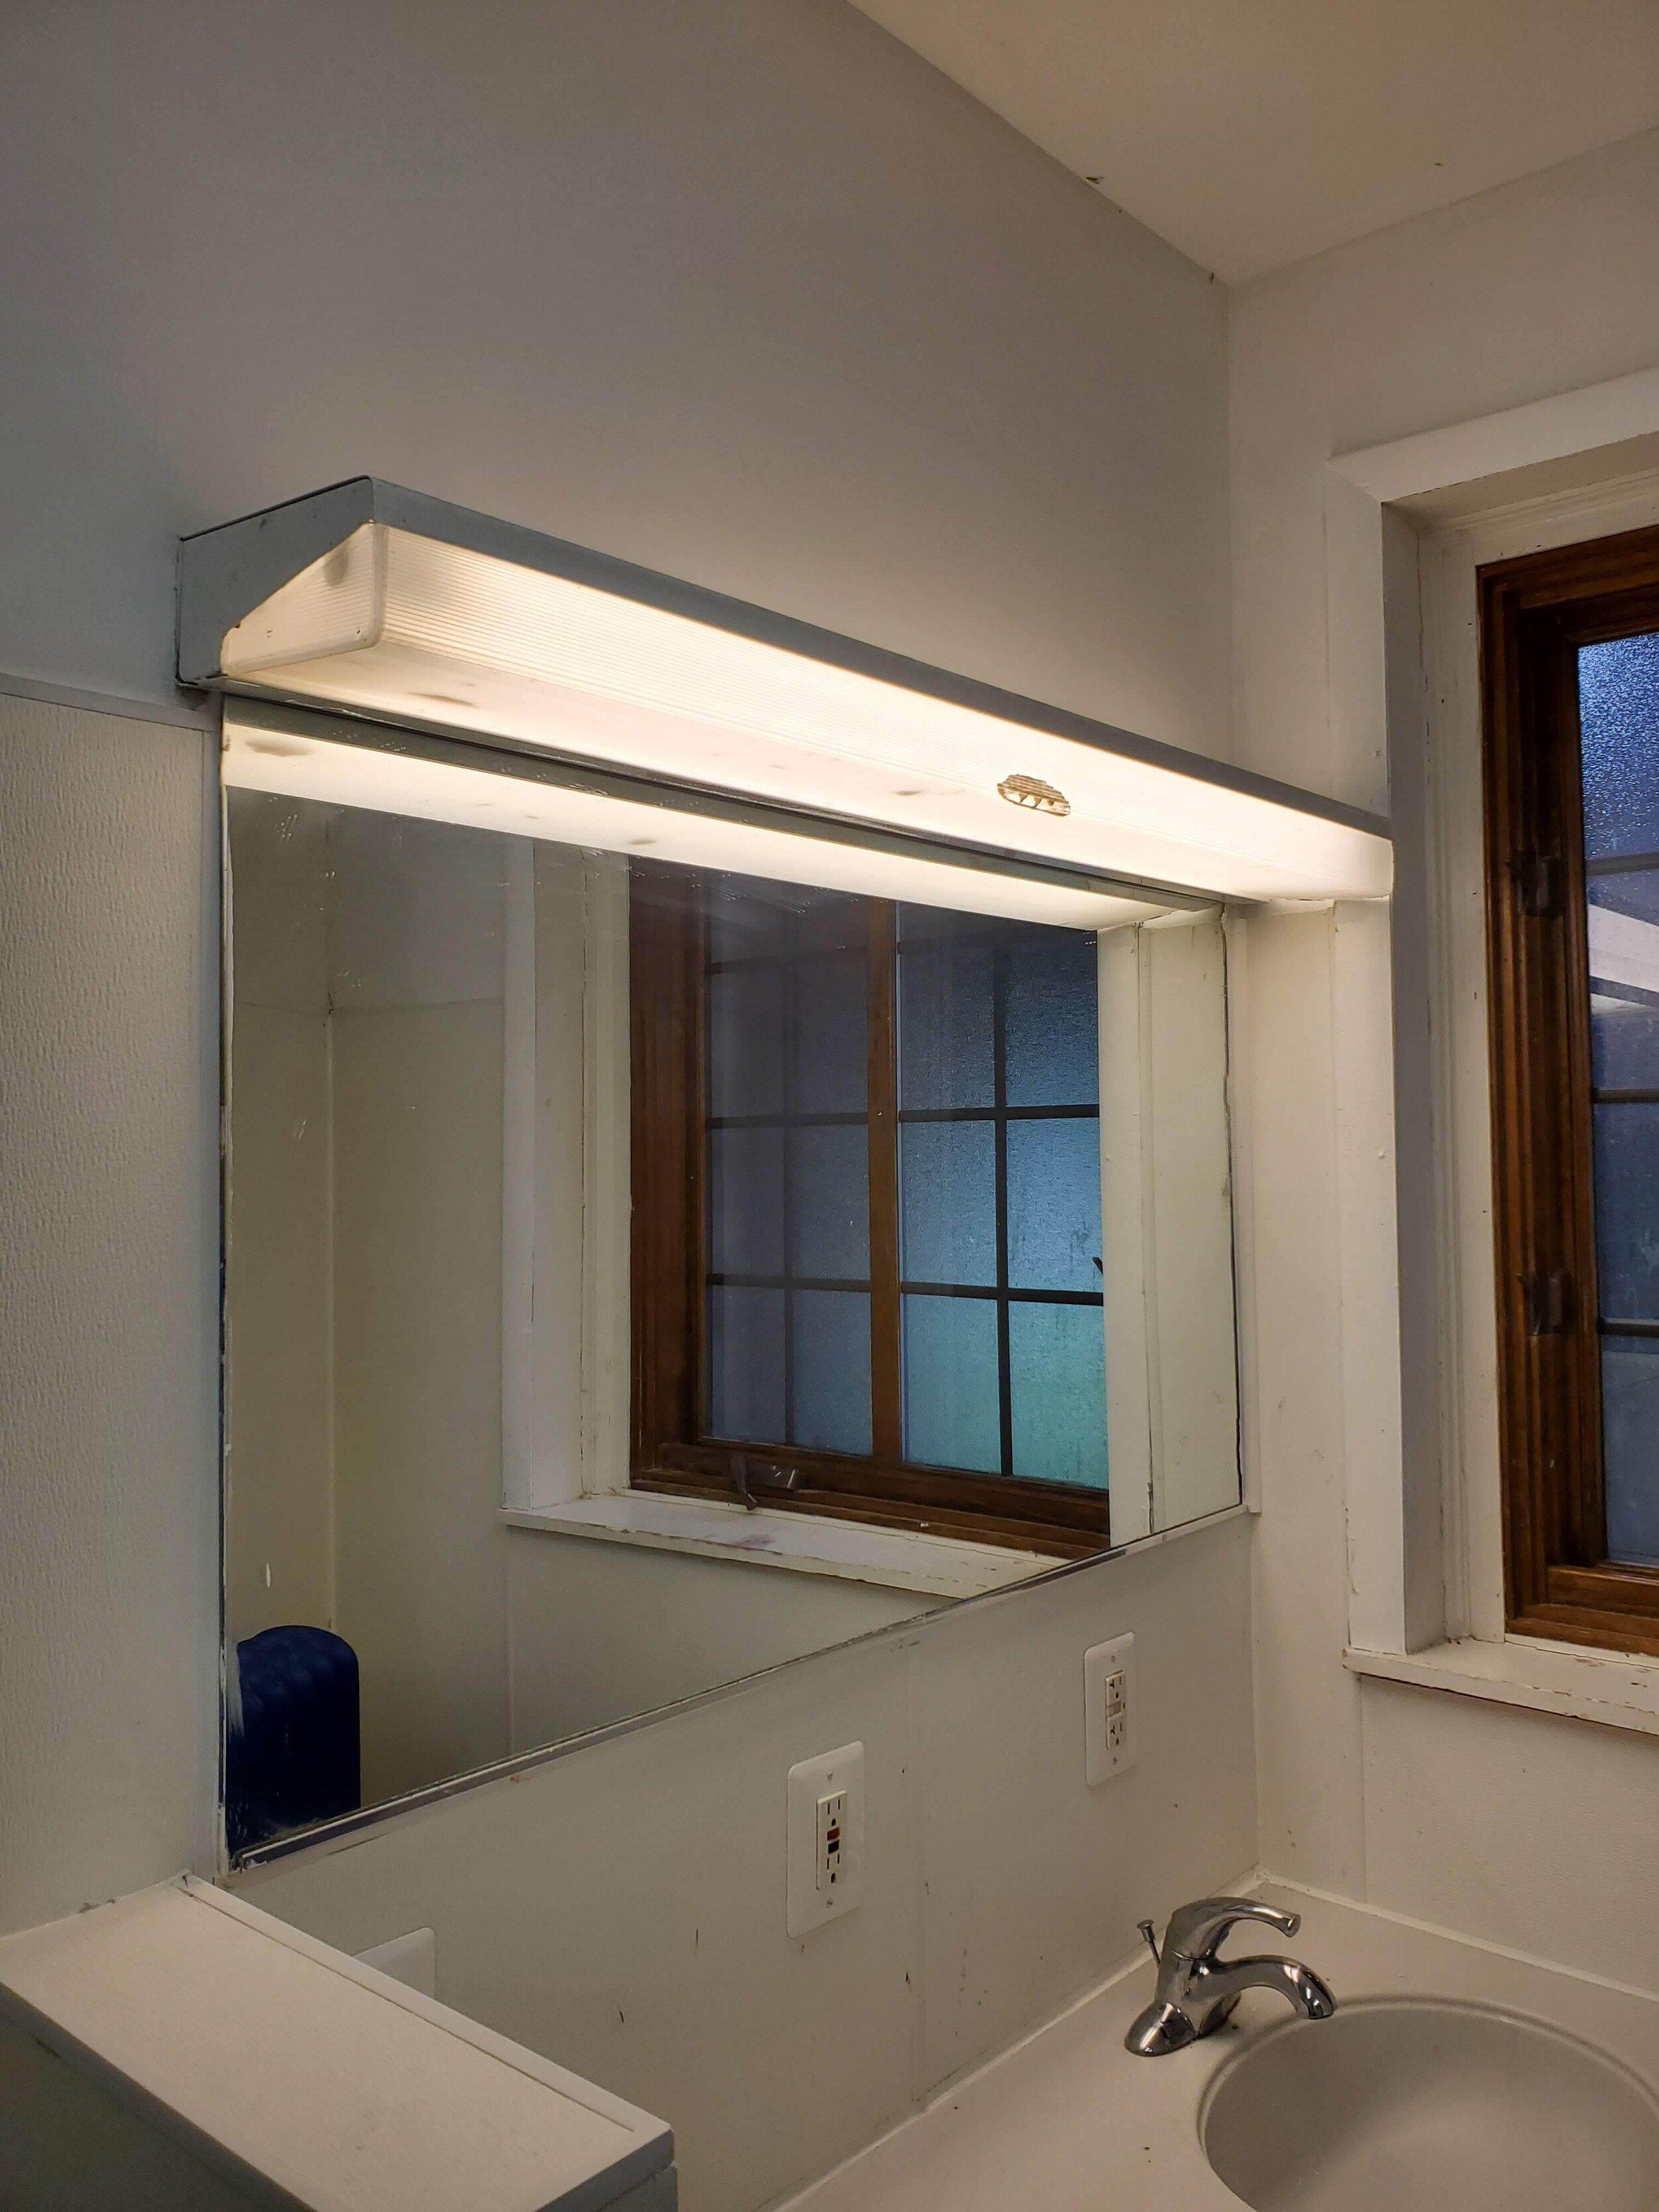 2019 First Floor Bathroom Renovation 20190903_112859.jpg